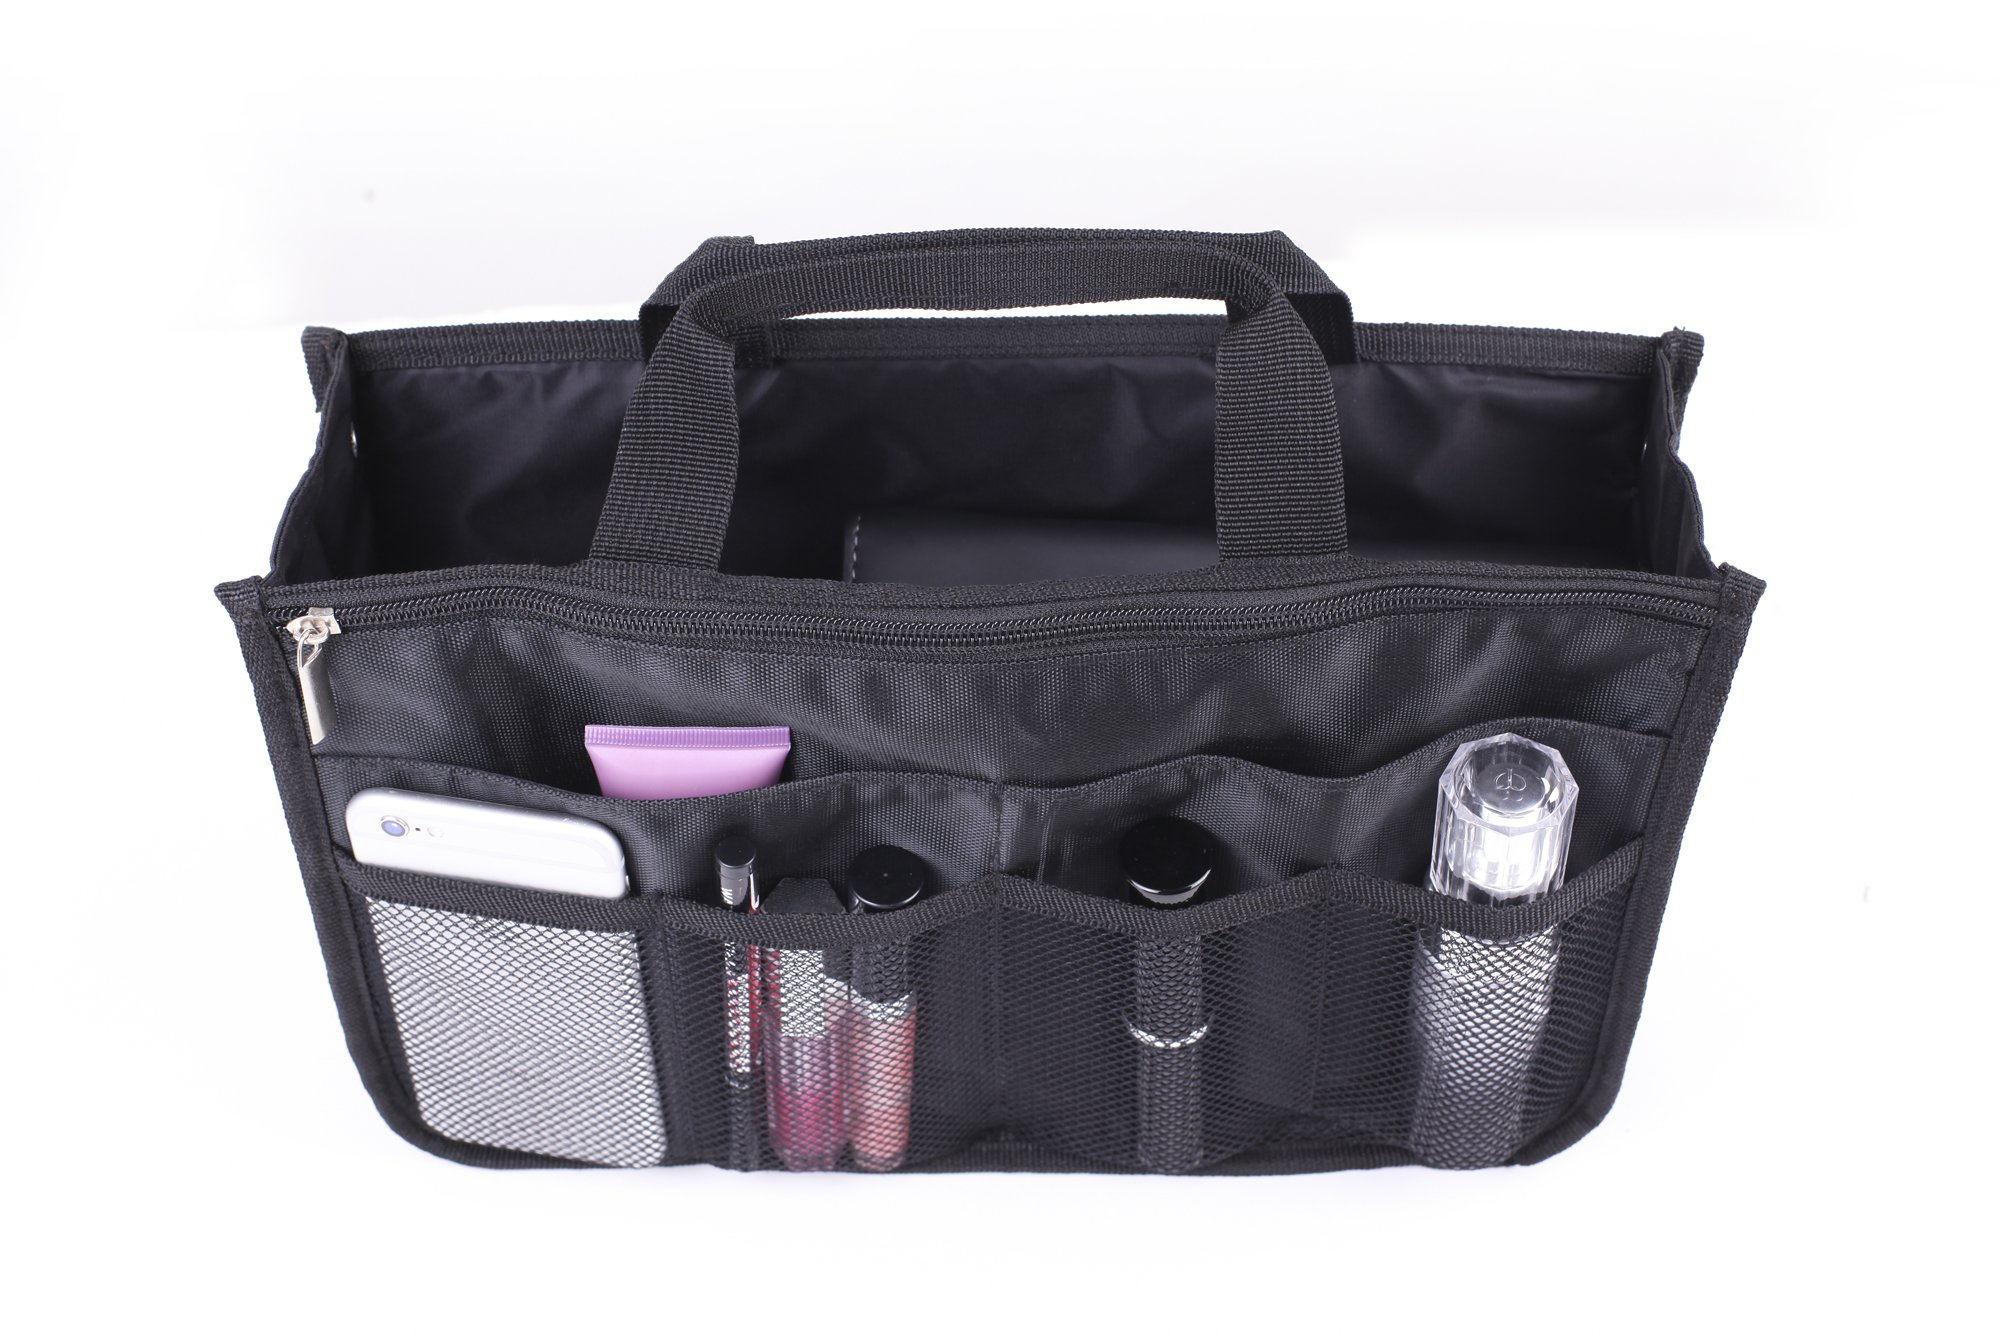 RW Collections Handbag Organizer, Liner, Sturdy Nylon Purse Insert (2X-Large, Black)